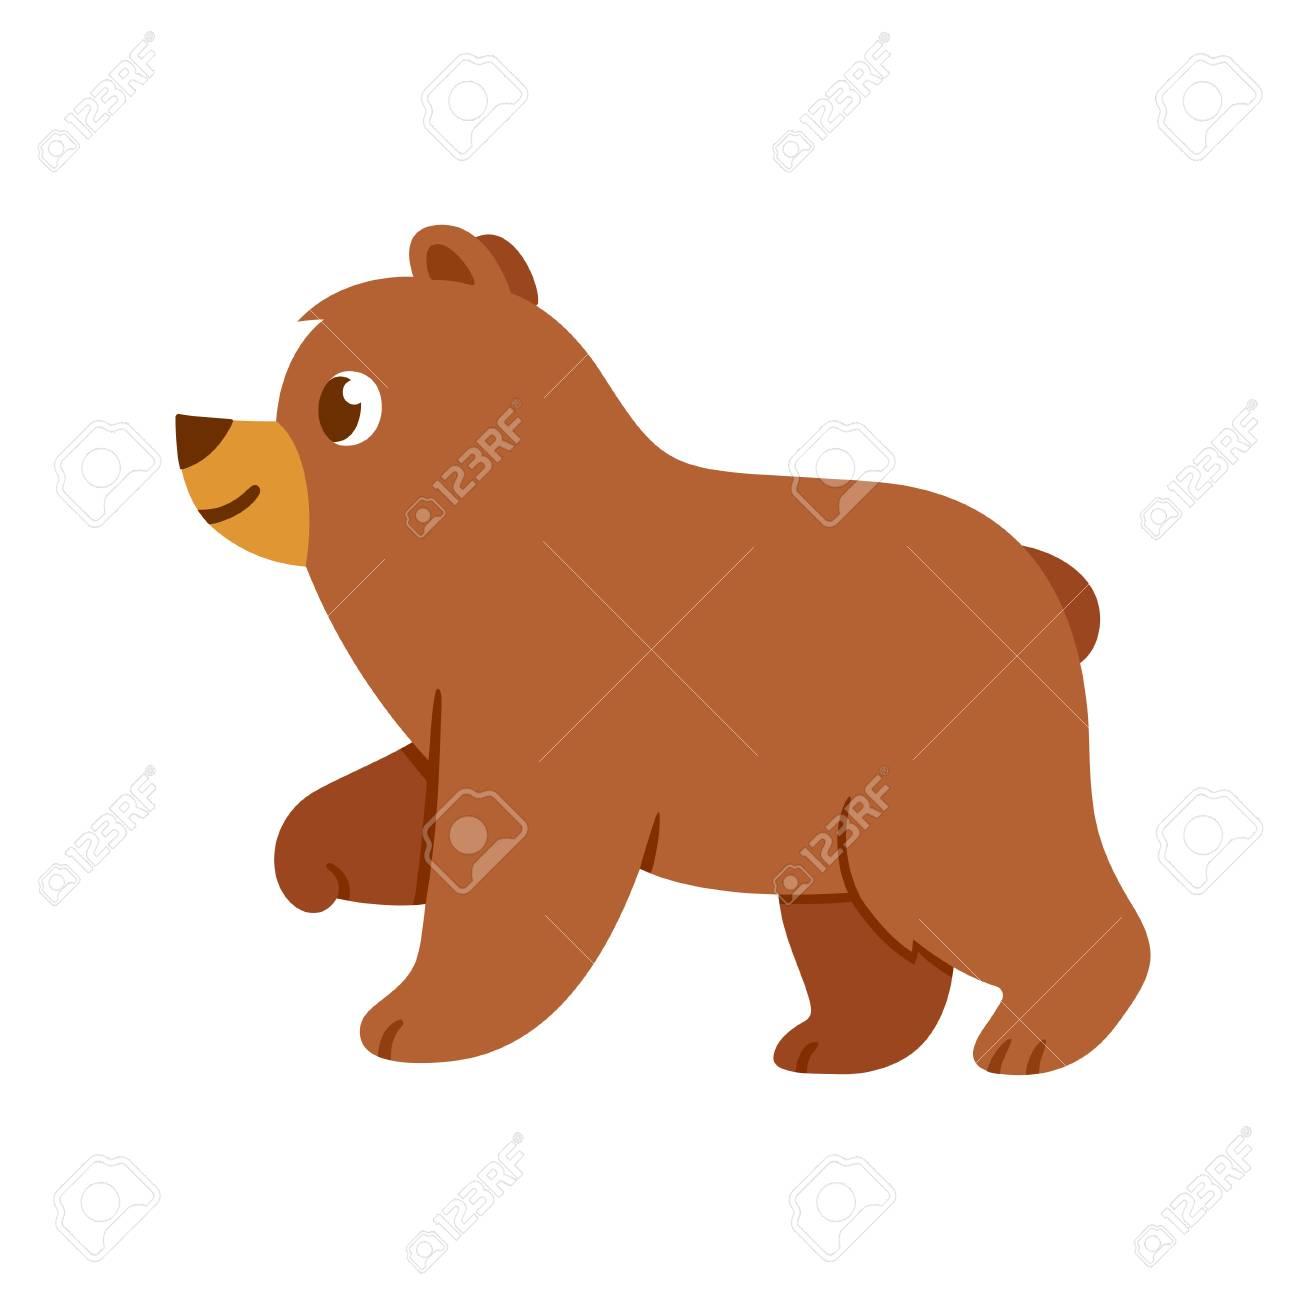 1300x1300 Cute Cartoon Baby Bear Drawing. Brown Bear Standing In Profile